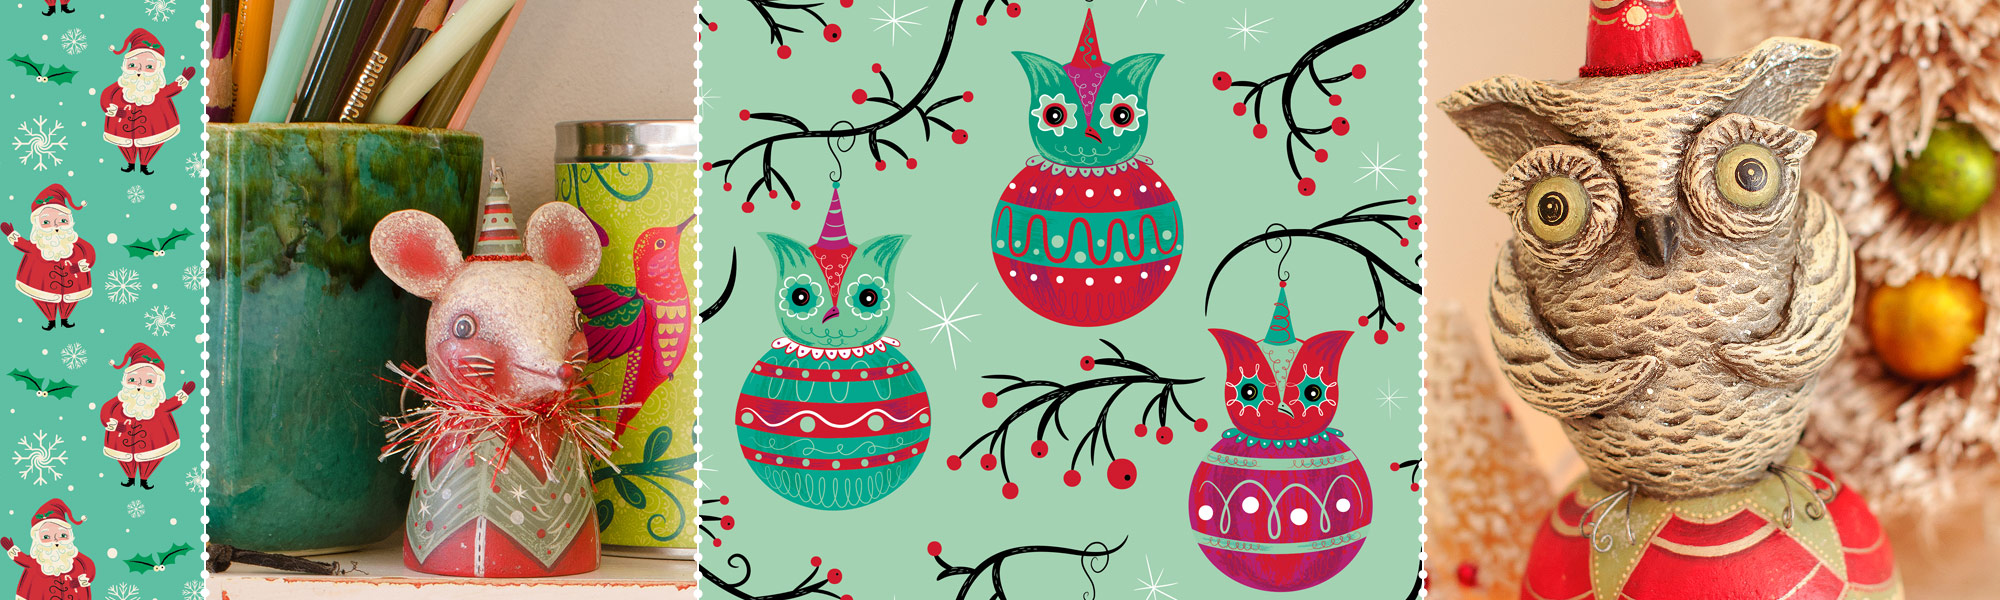 Johanna-Parker-Christmas-Banner-4.jpg